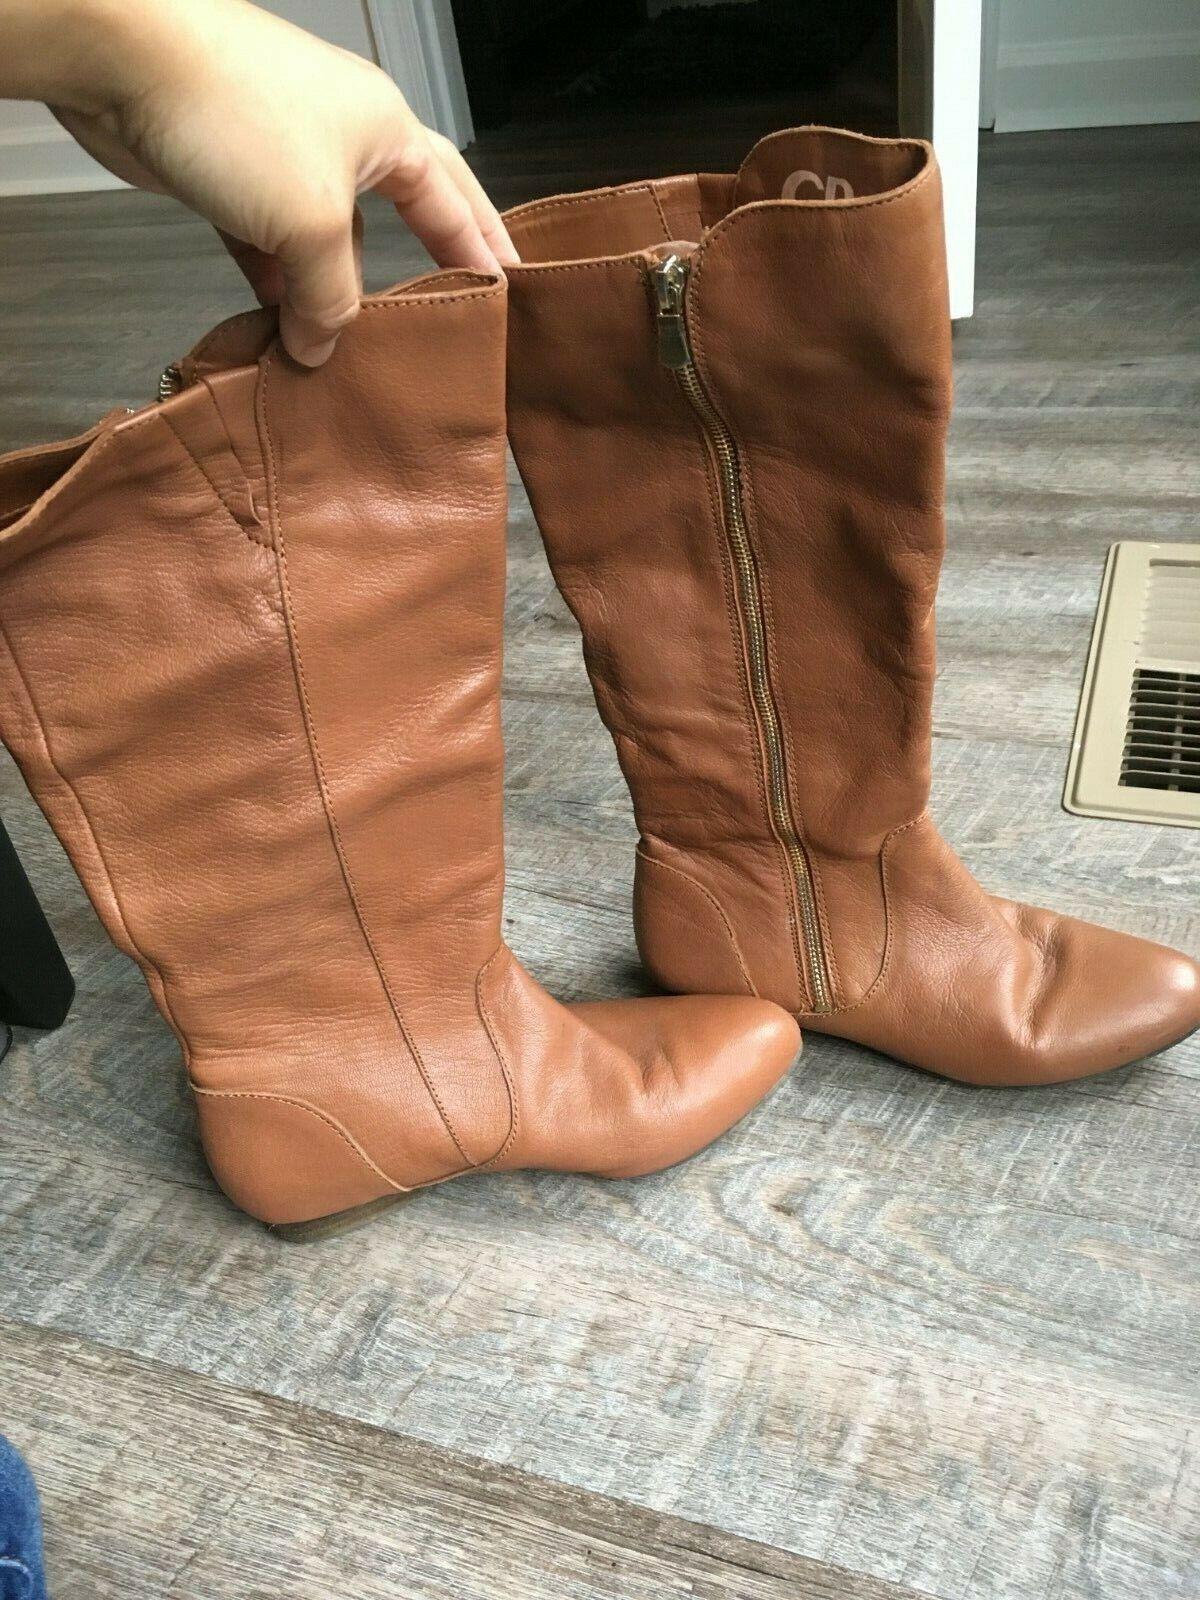 Gianni Bini Light Brown Boots US Size 6.5